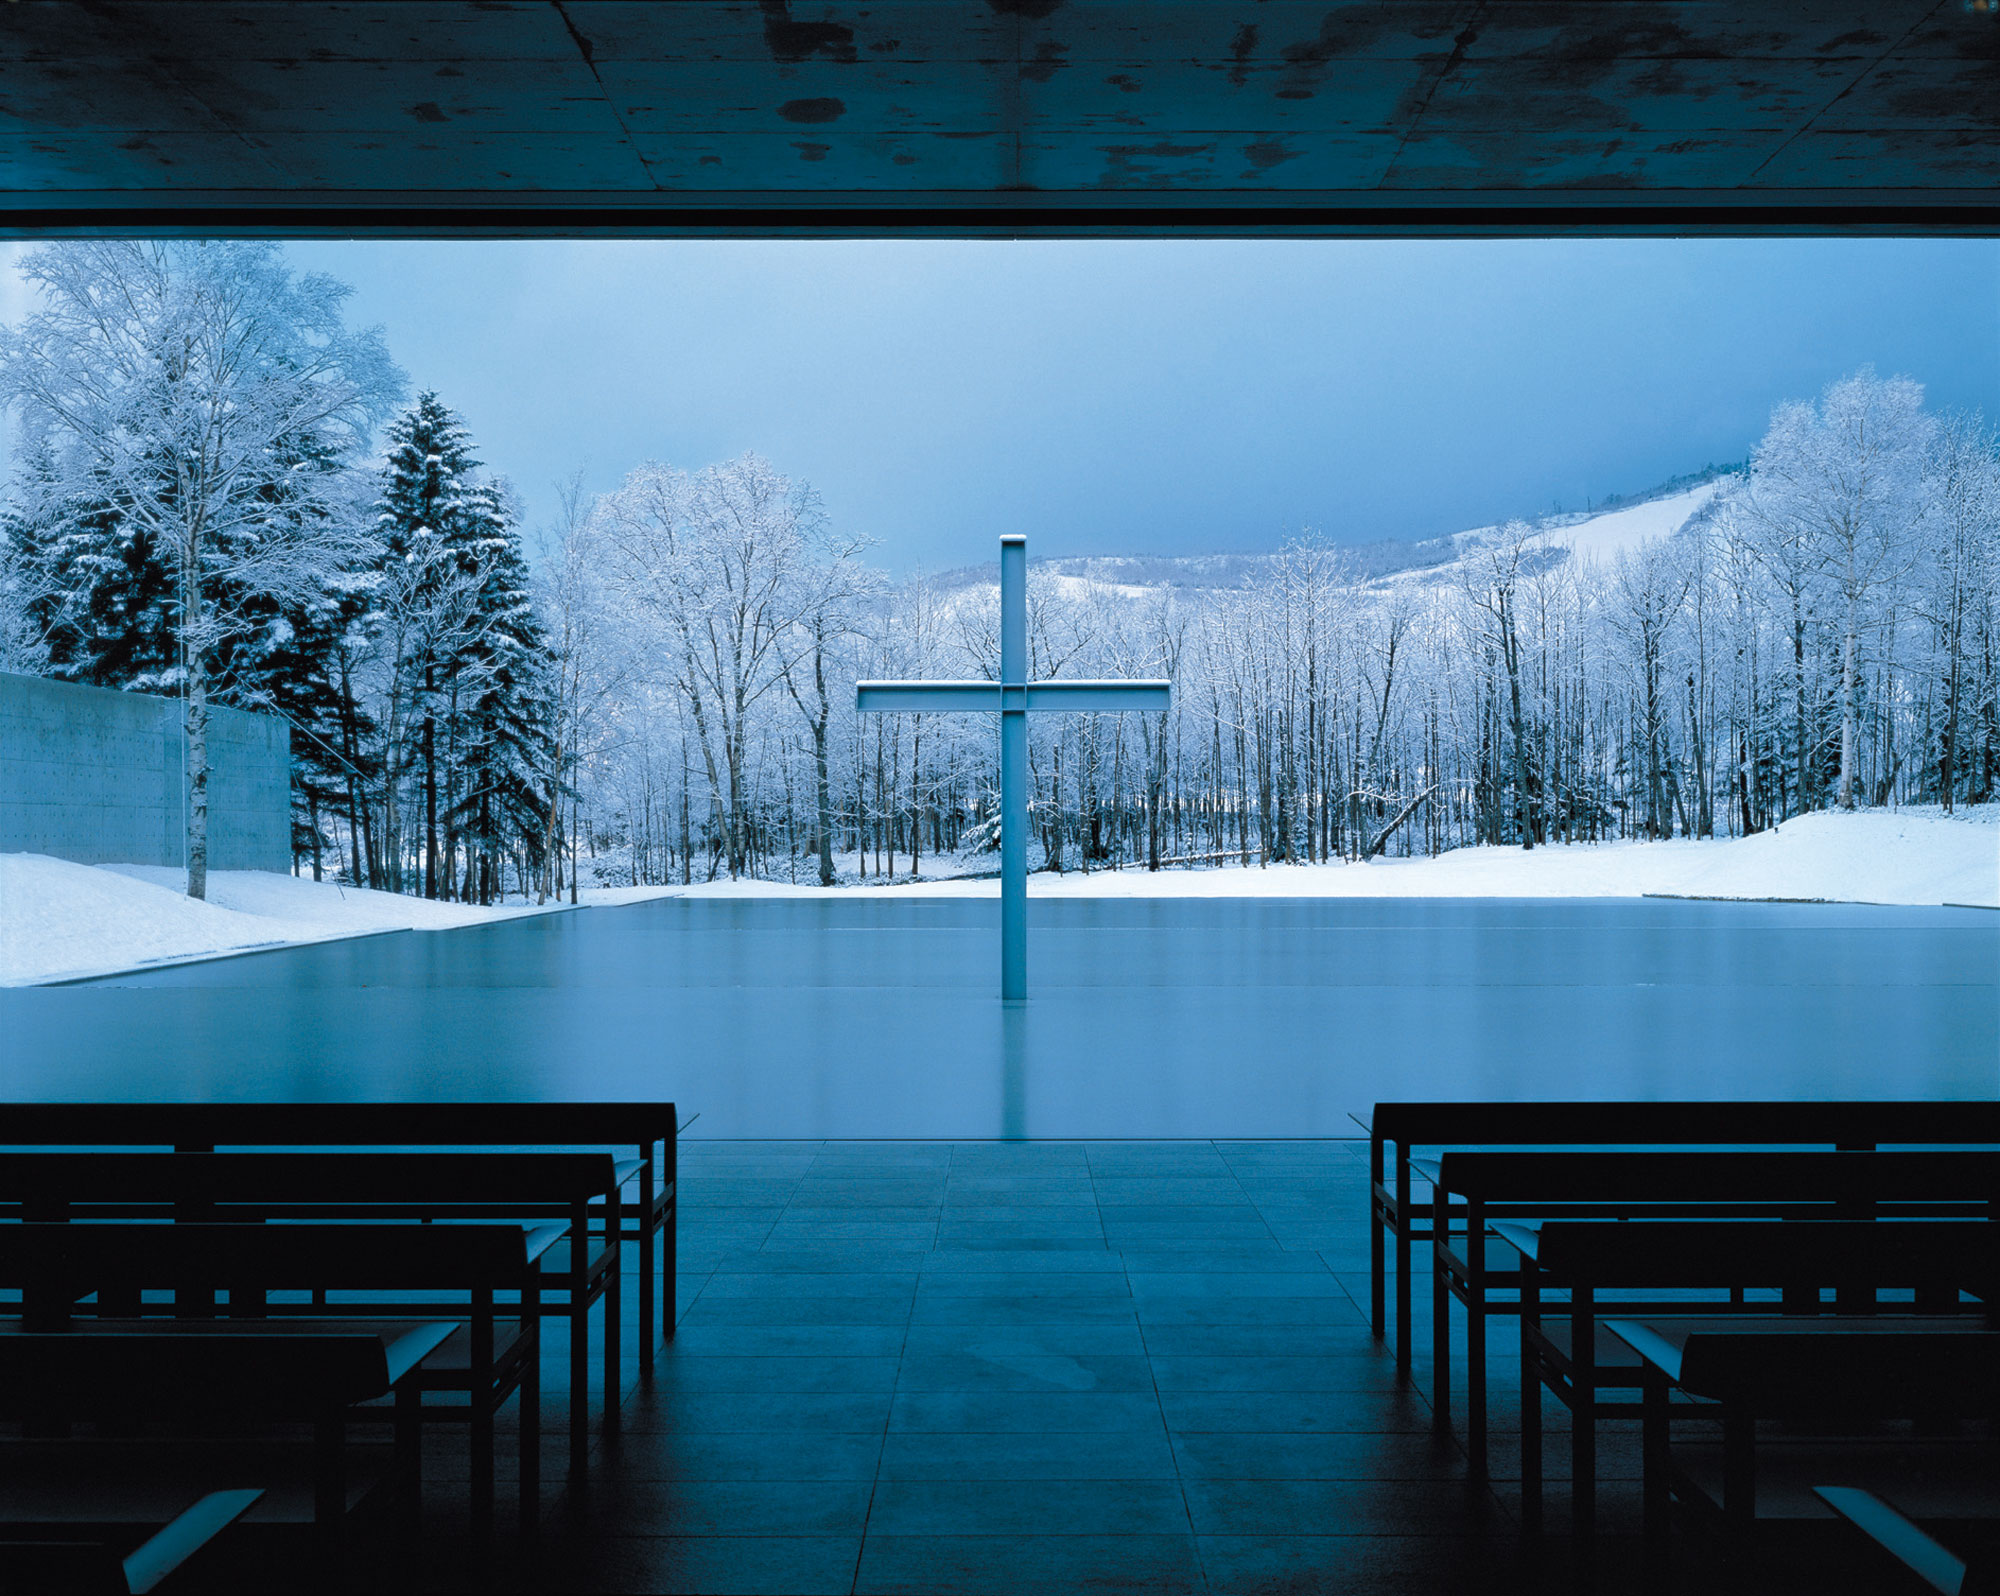 水の教会 (1988) 北海道勇払郡 撮影: 白鳥美雄 / Church on the Water (1988) Yufutsu-gun, Hokkaido Photo: Yoshio Shiratori